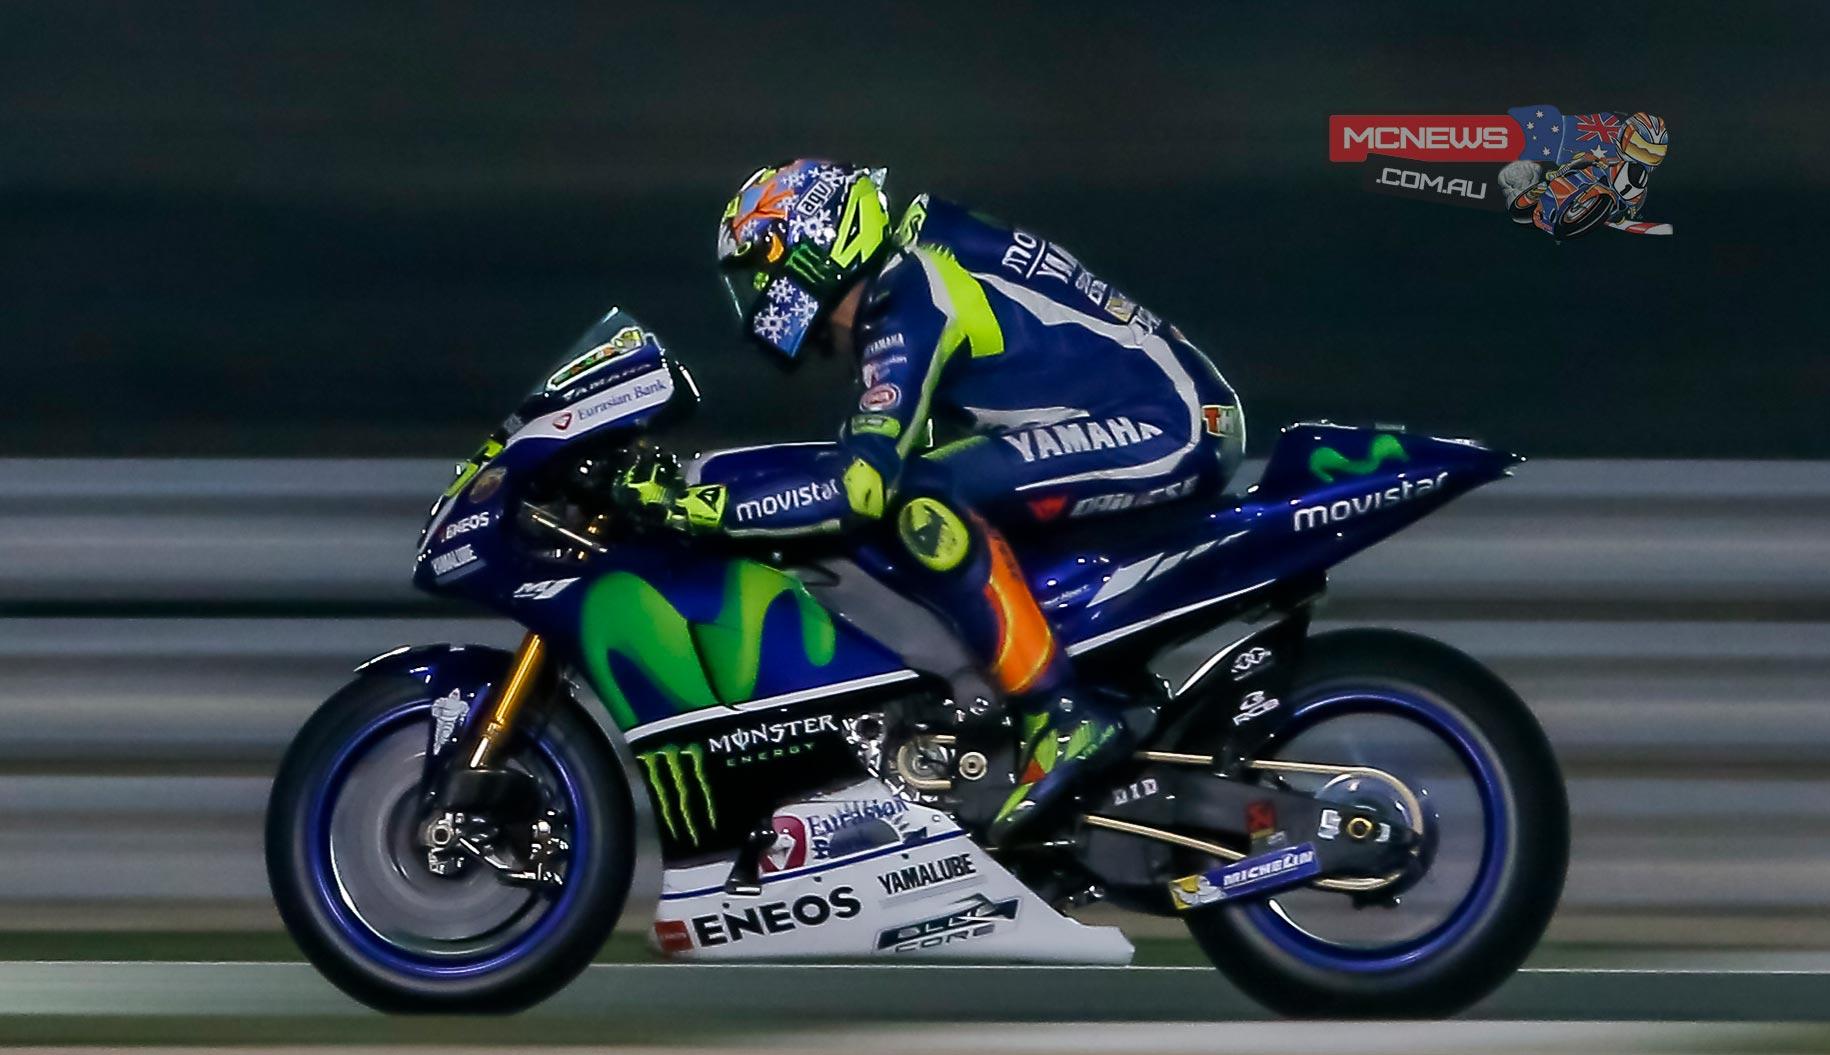 Qatar MotoGP Test | Vinales tops day two | MCNews.com.au